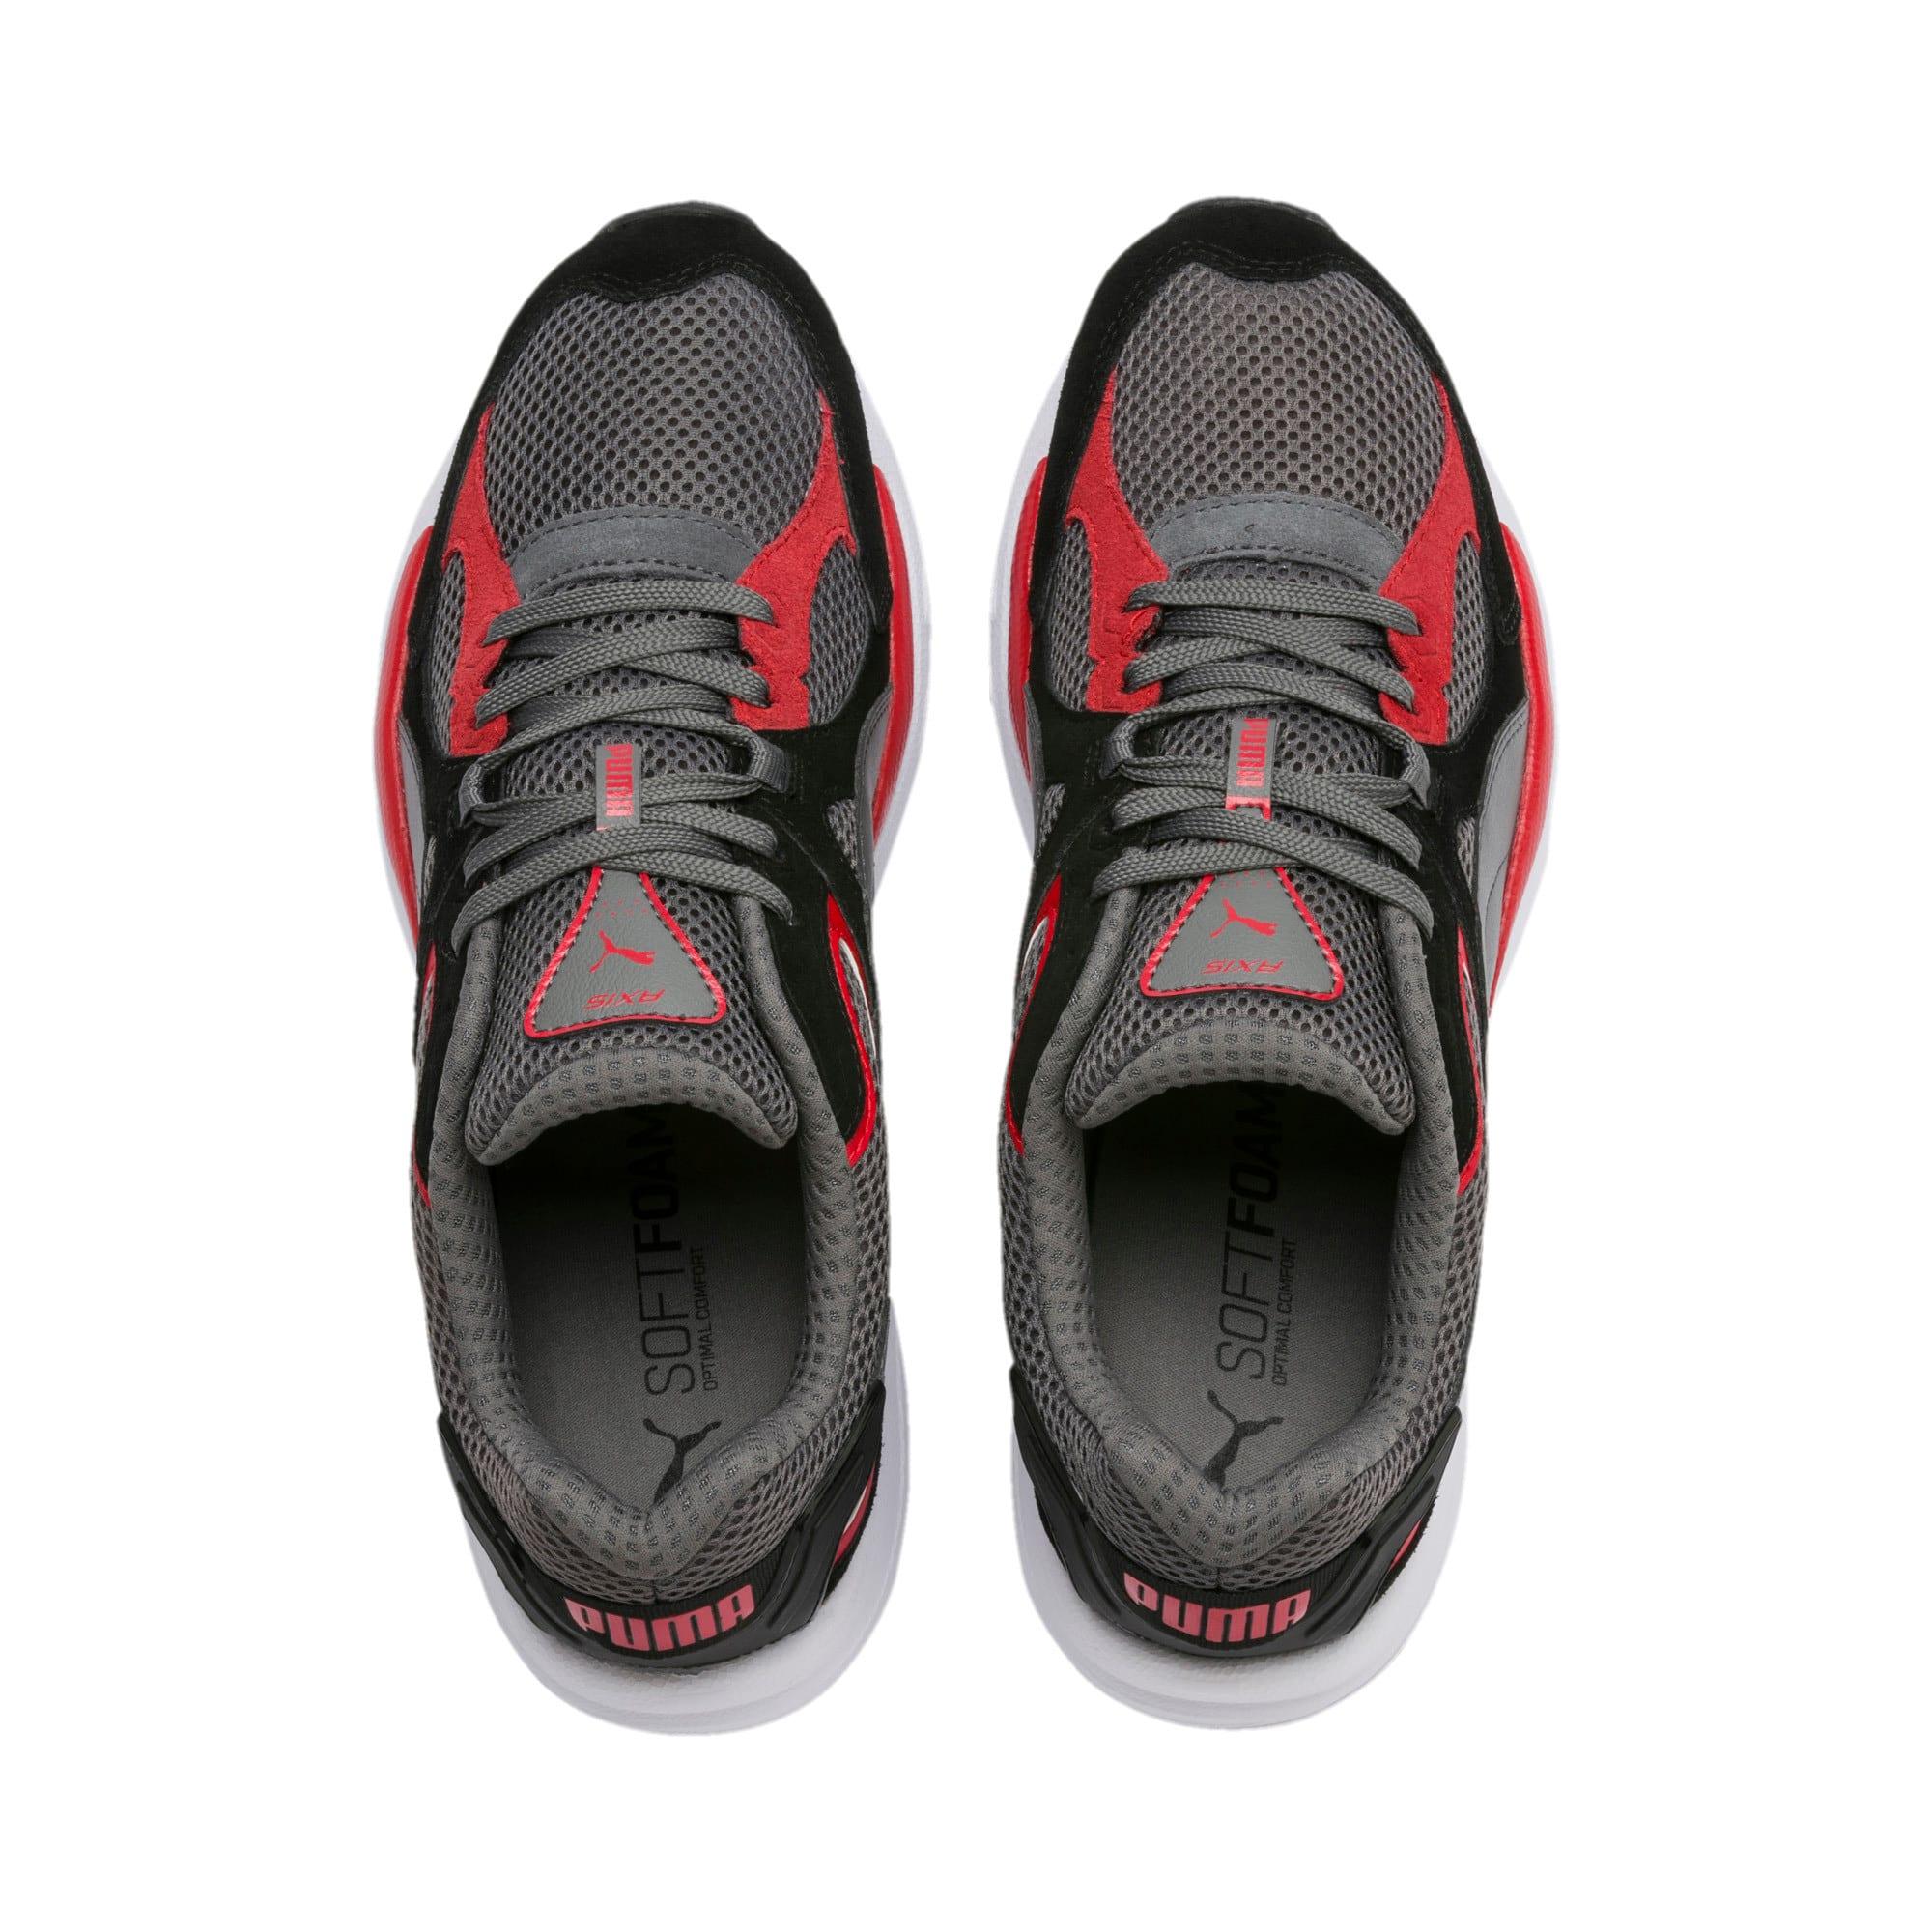 Thumbnail 7 of Axis Plus SD sneakers, CASTLEROCK-Black-Red-White, medium